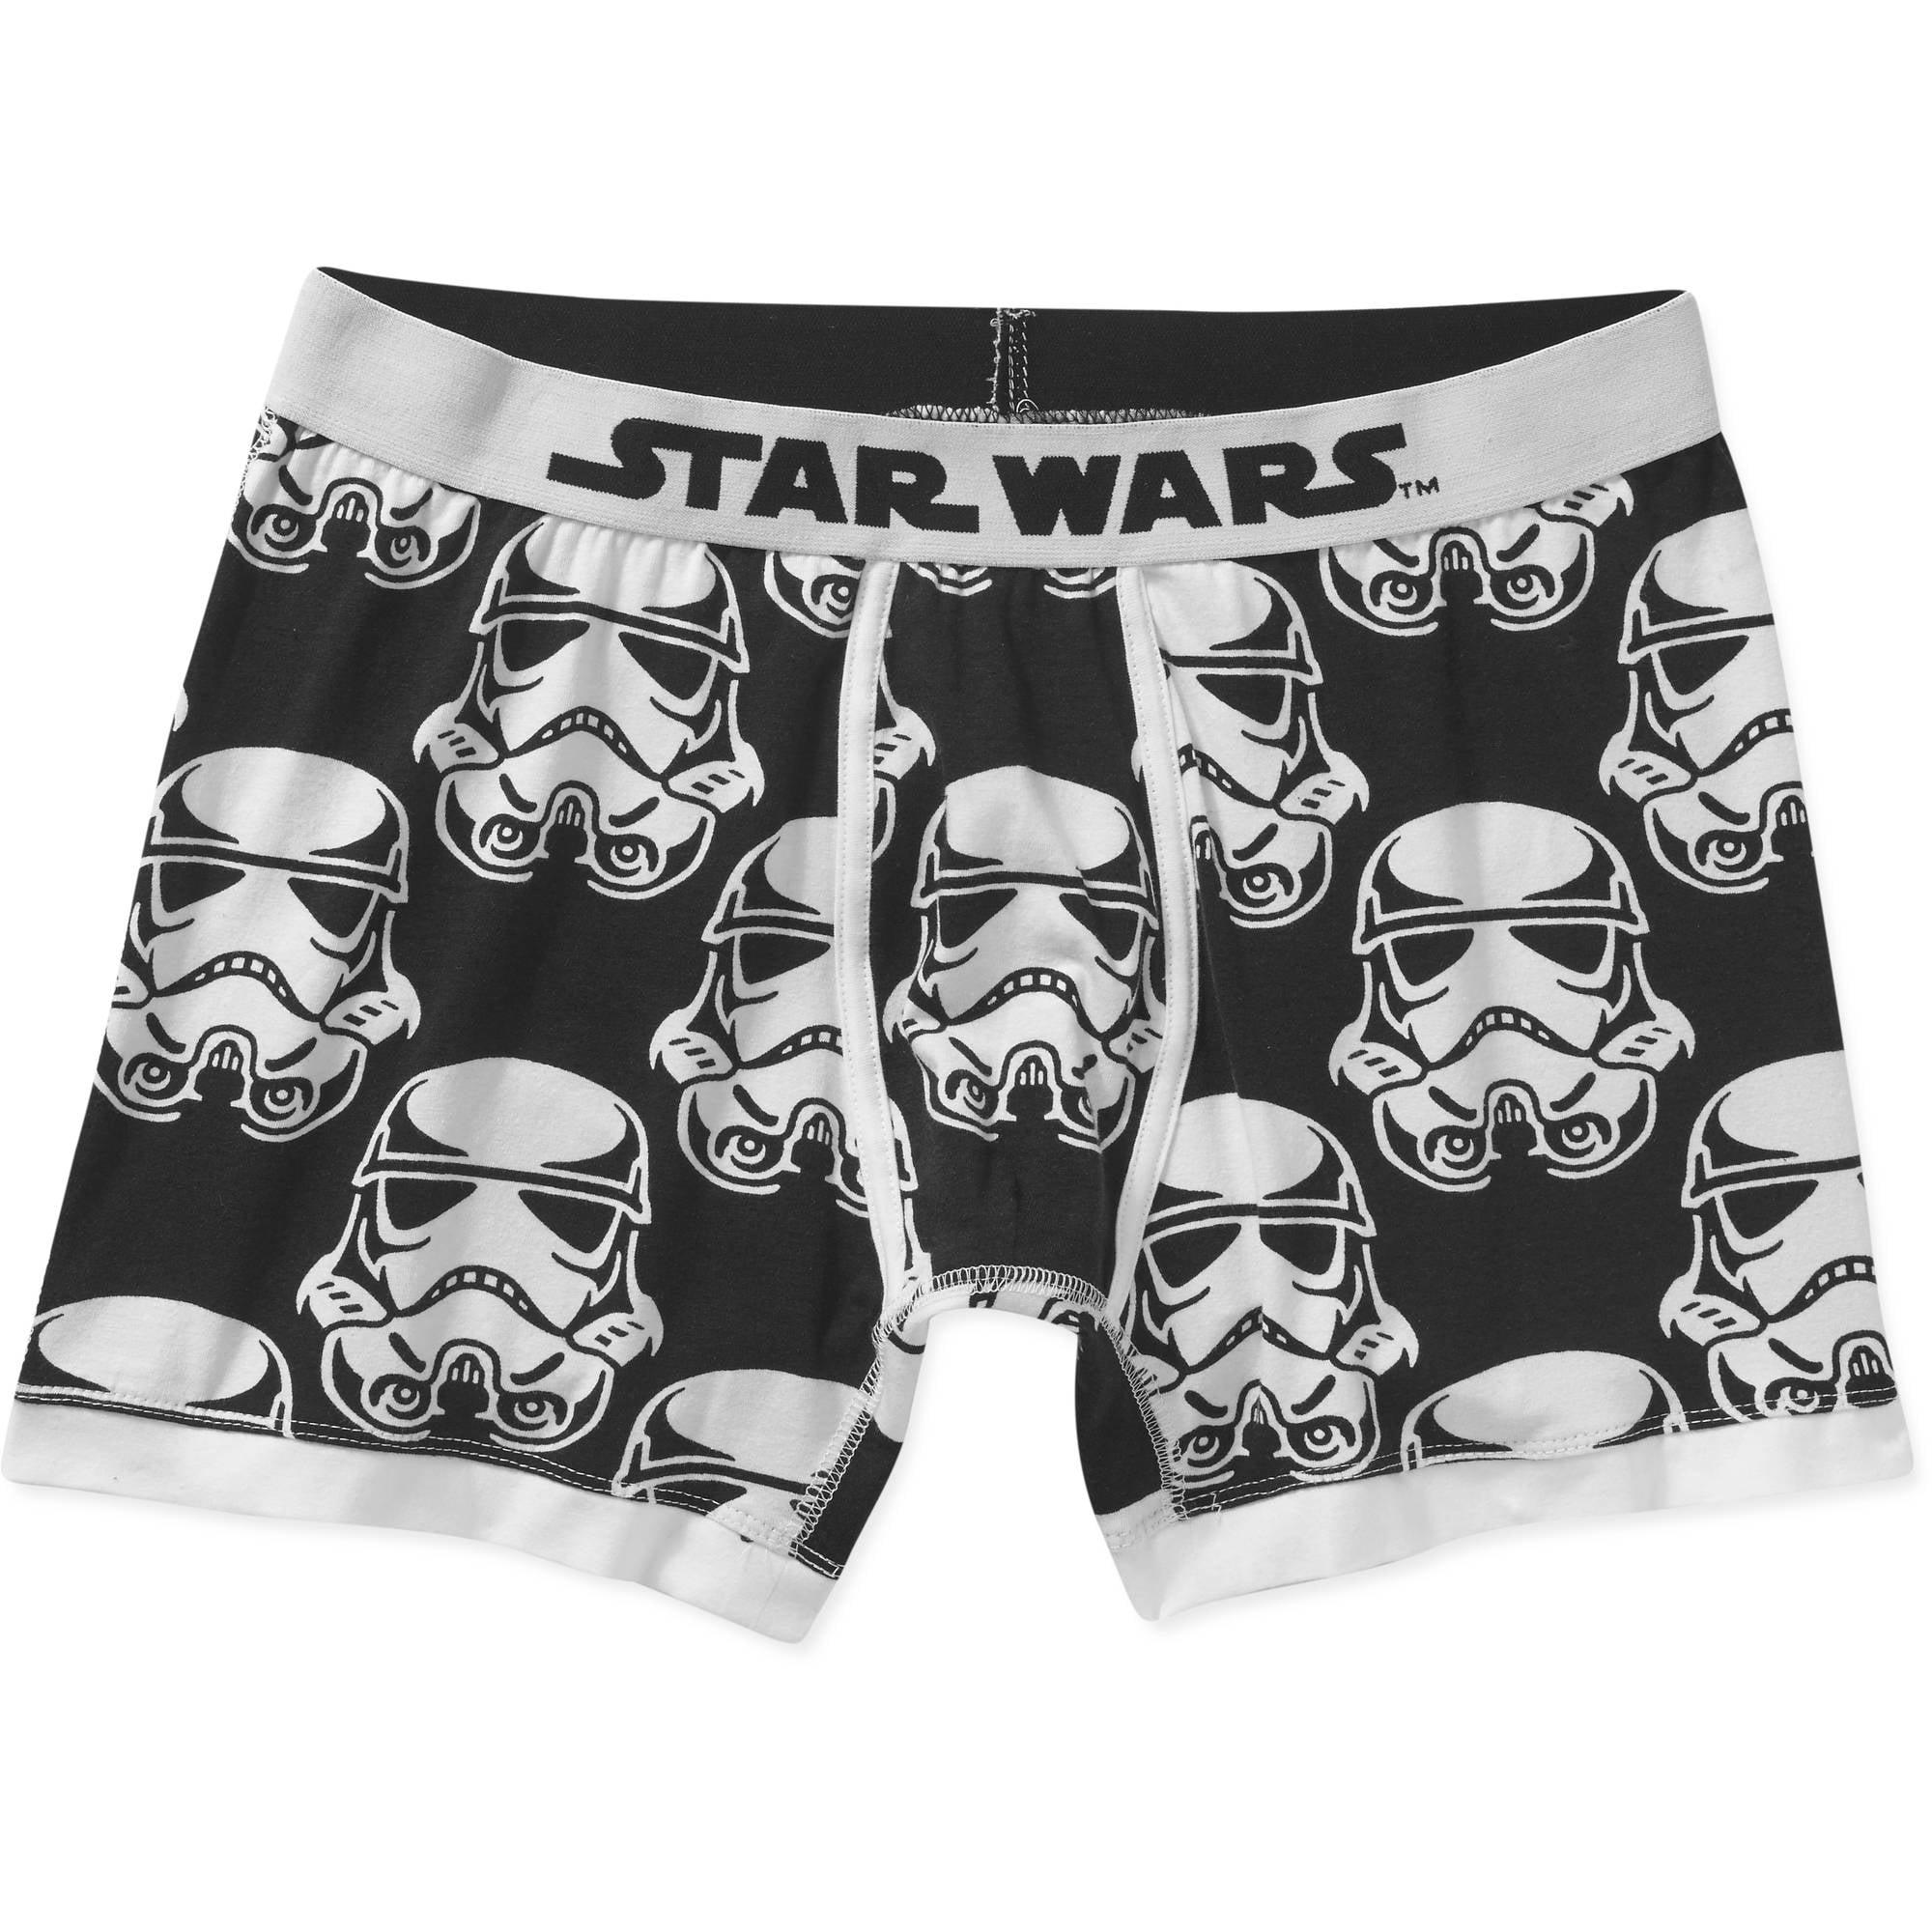 Star Wars Trooper Mugshot Men's Boxer Brief